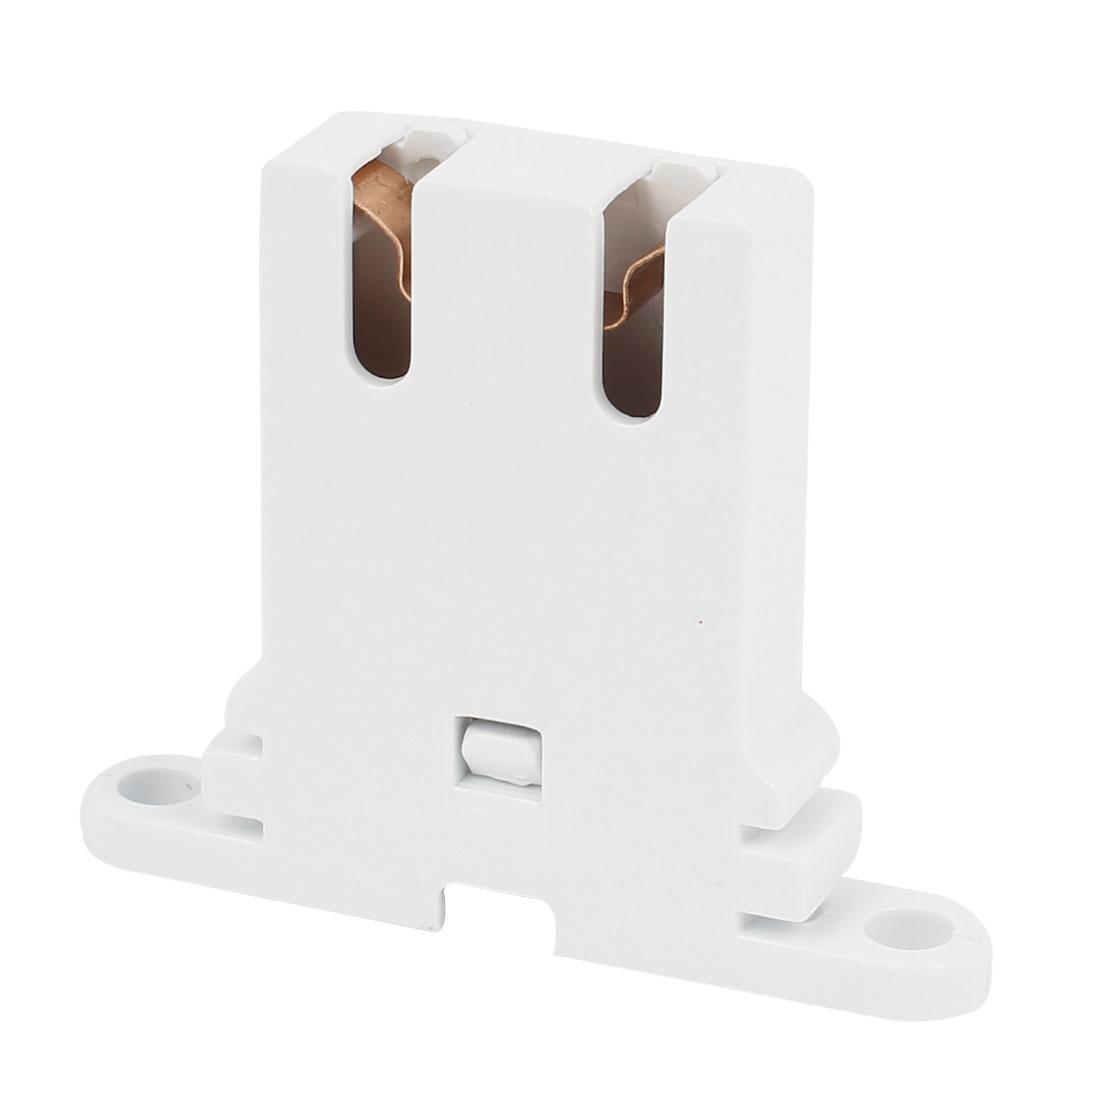 AC 250V 3A T8 Socket Aging Test Energy Saving Lamp Holder